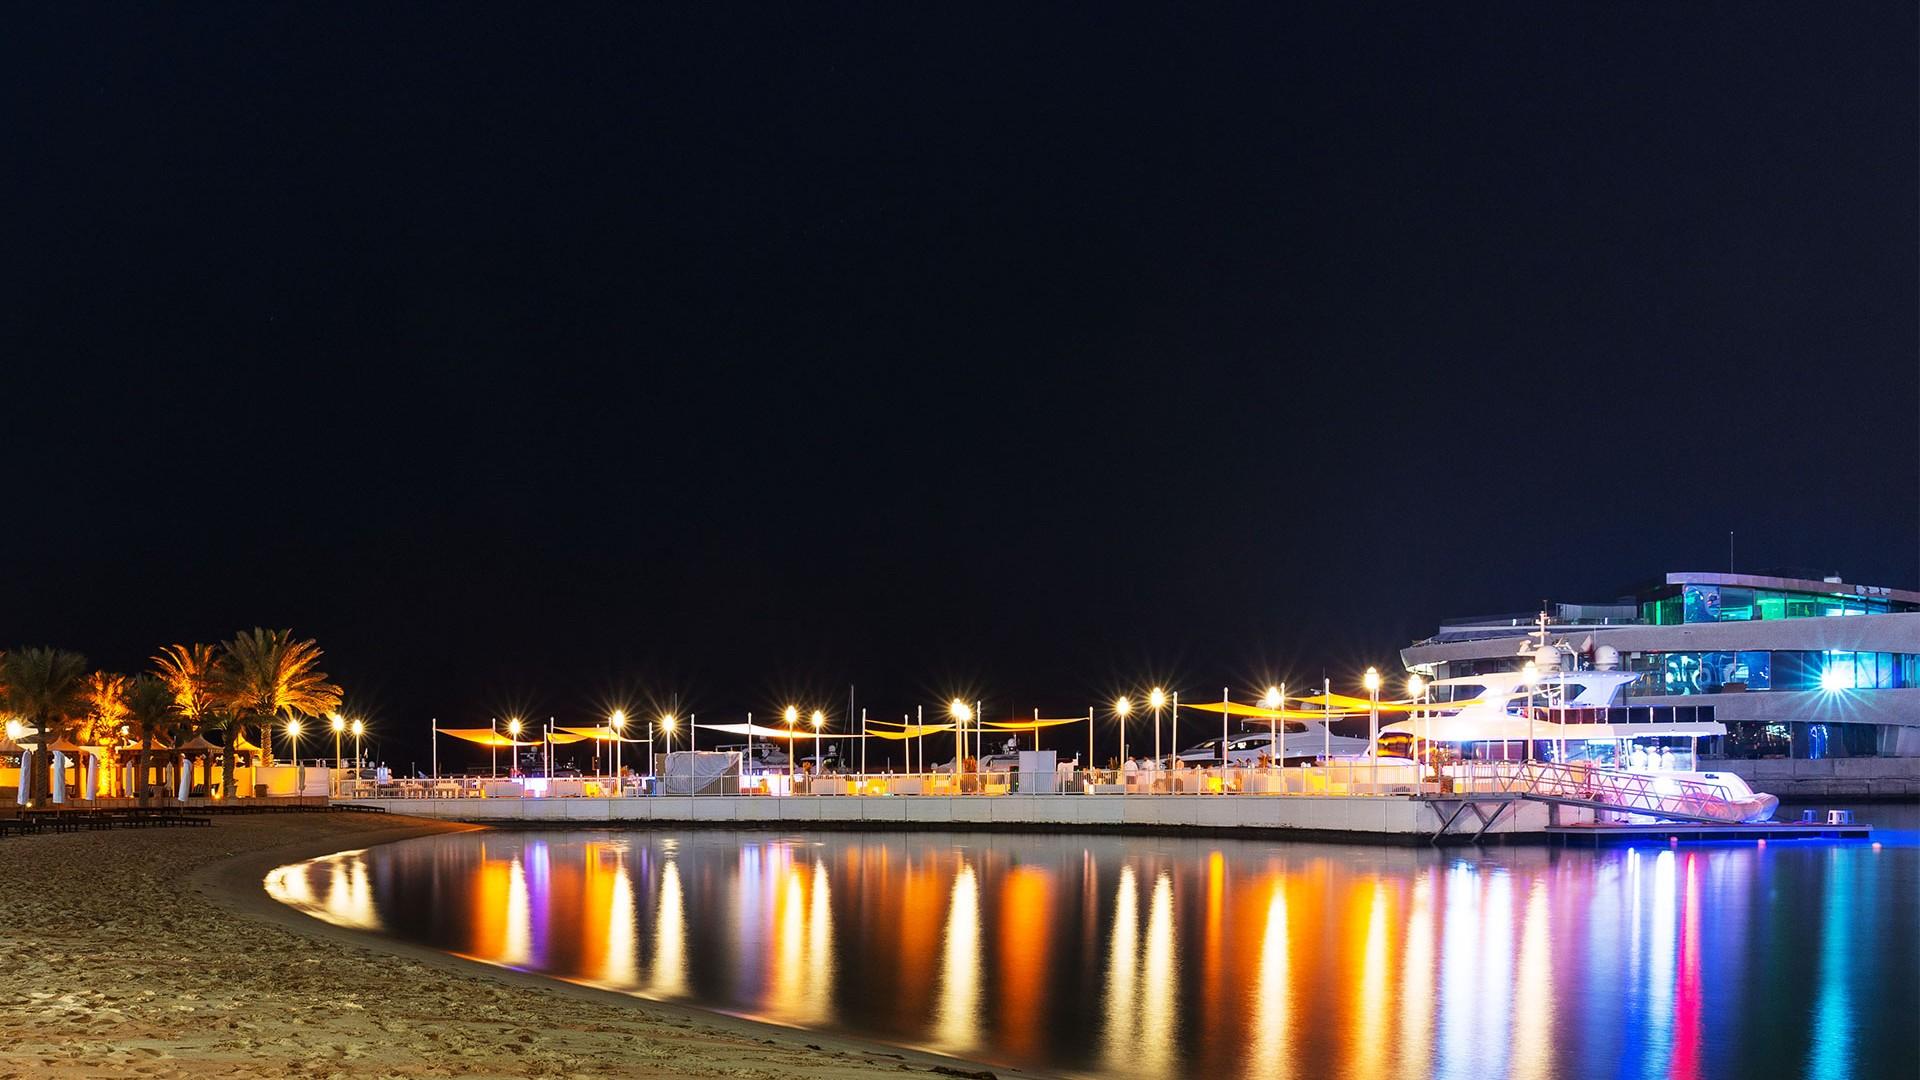 Four Seasons Doha at night